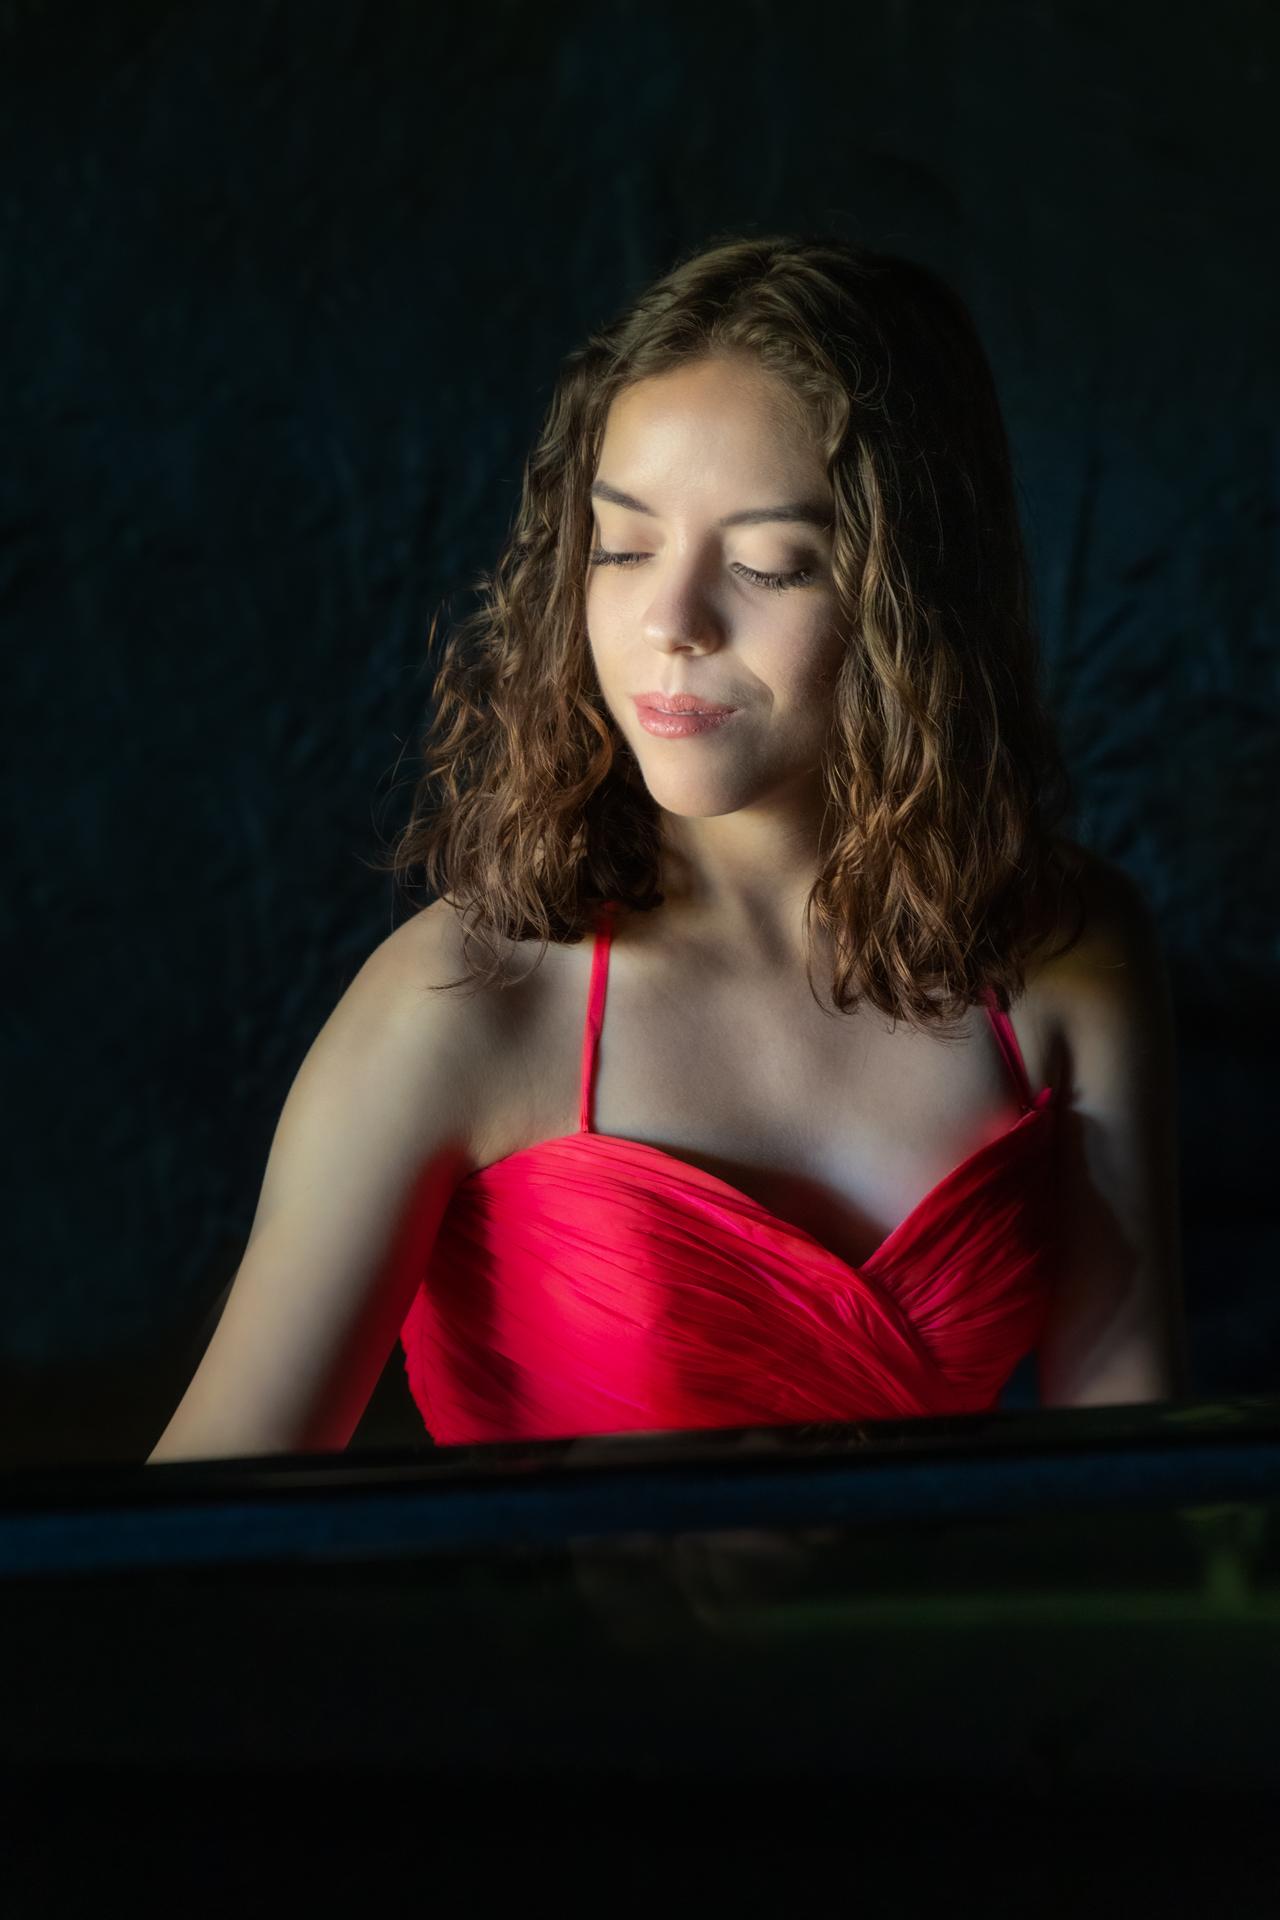 CFrenette-Julie au piano-6